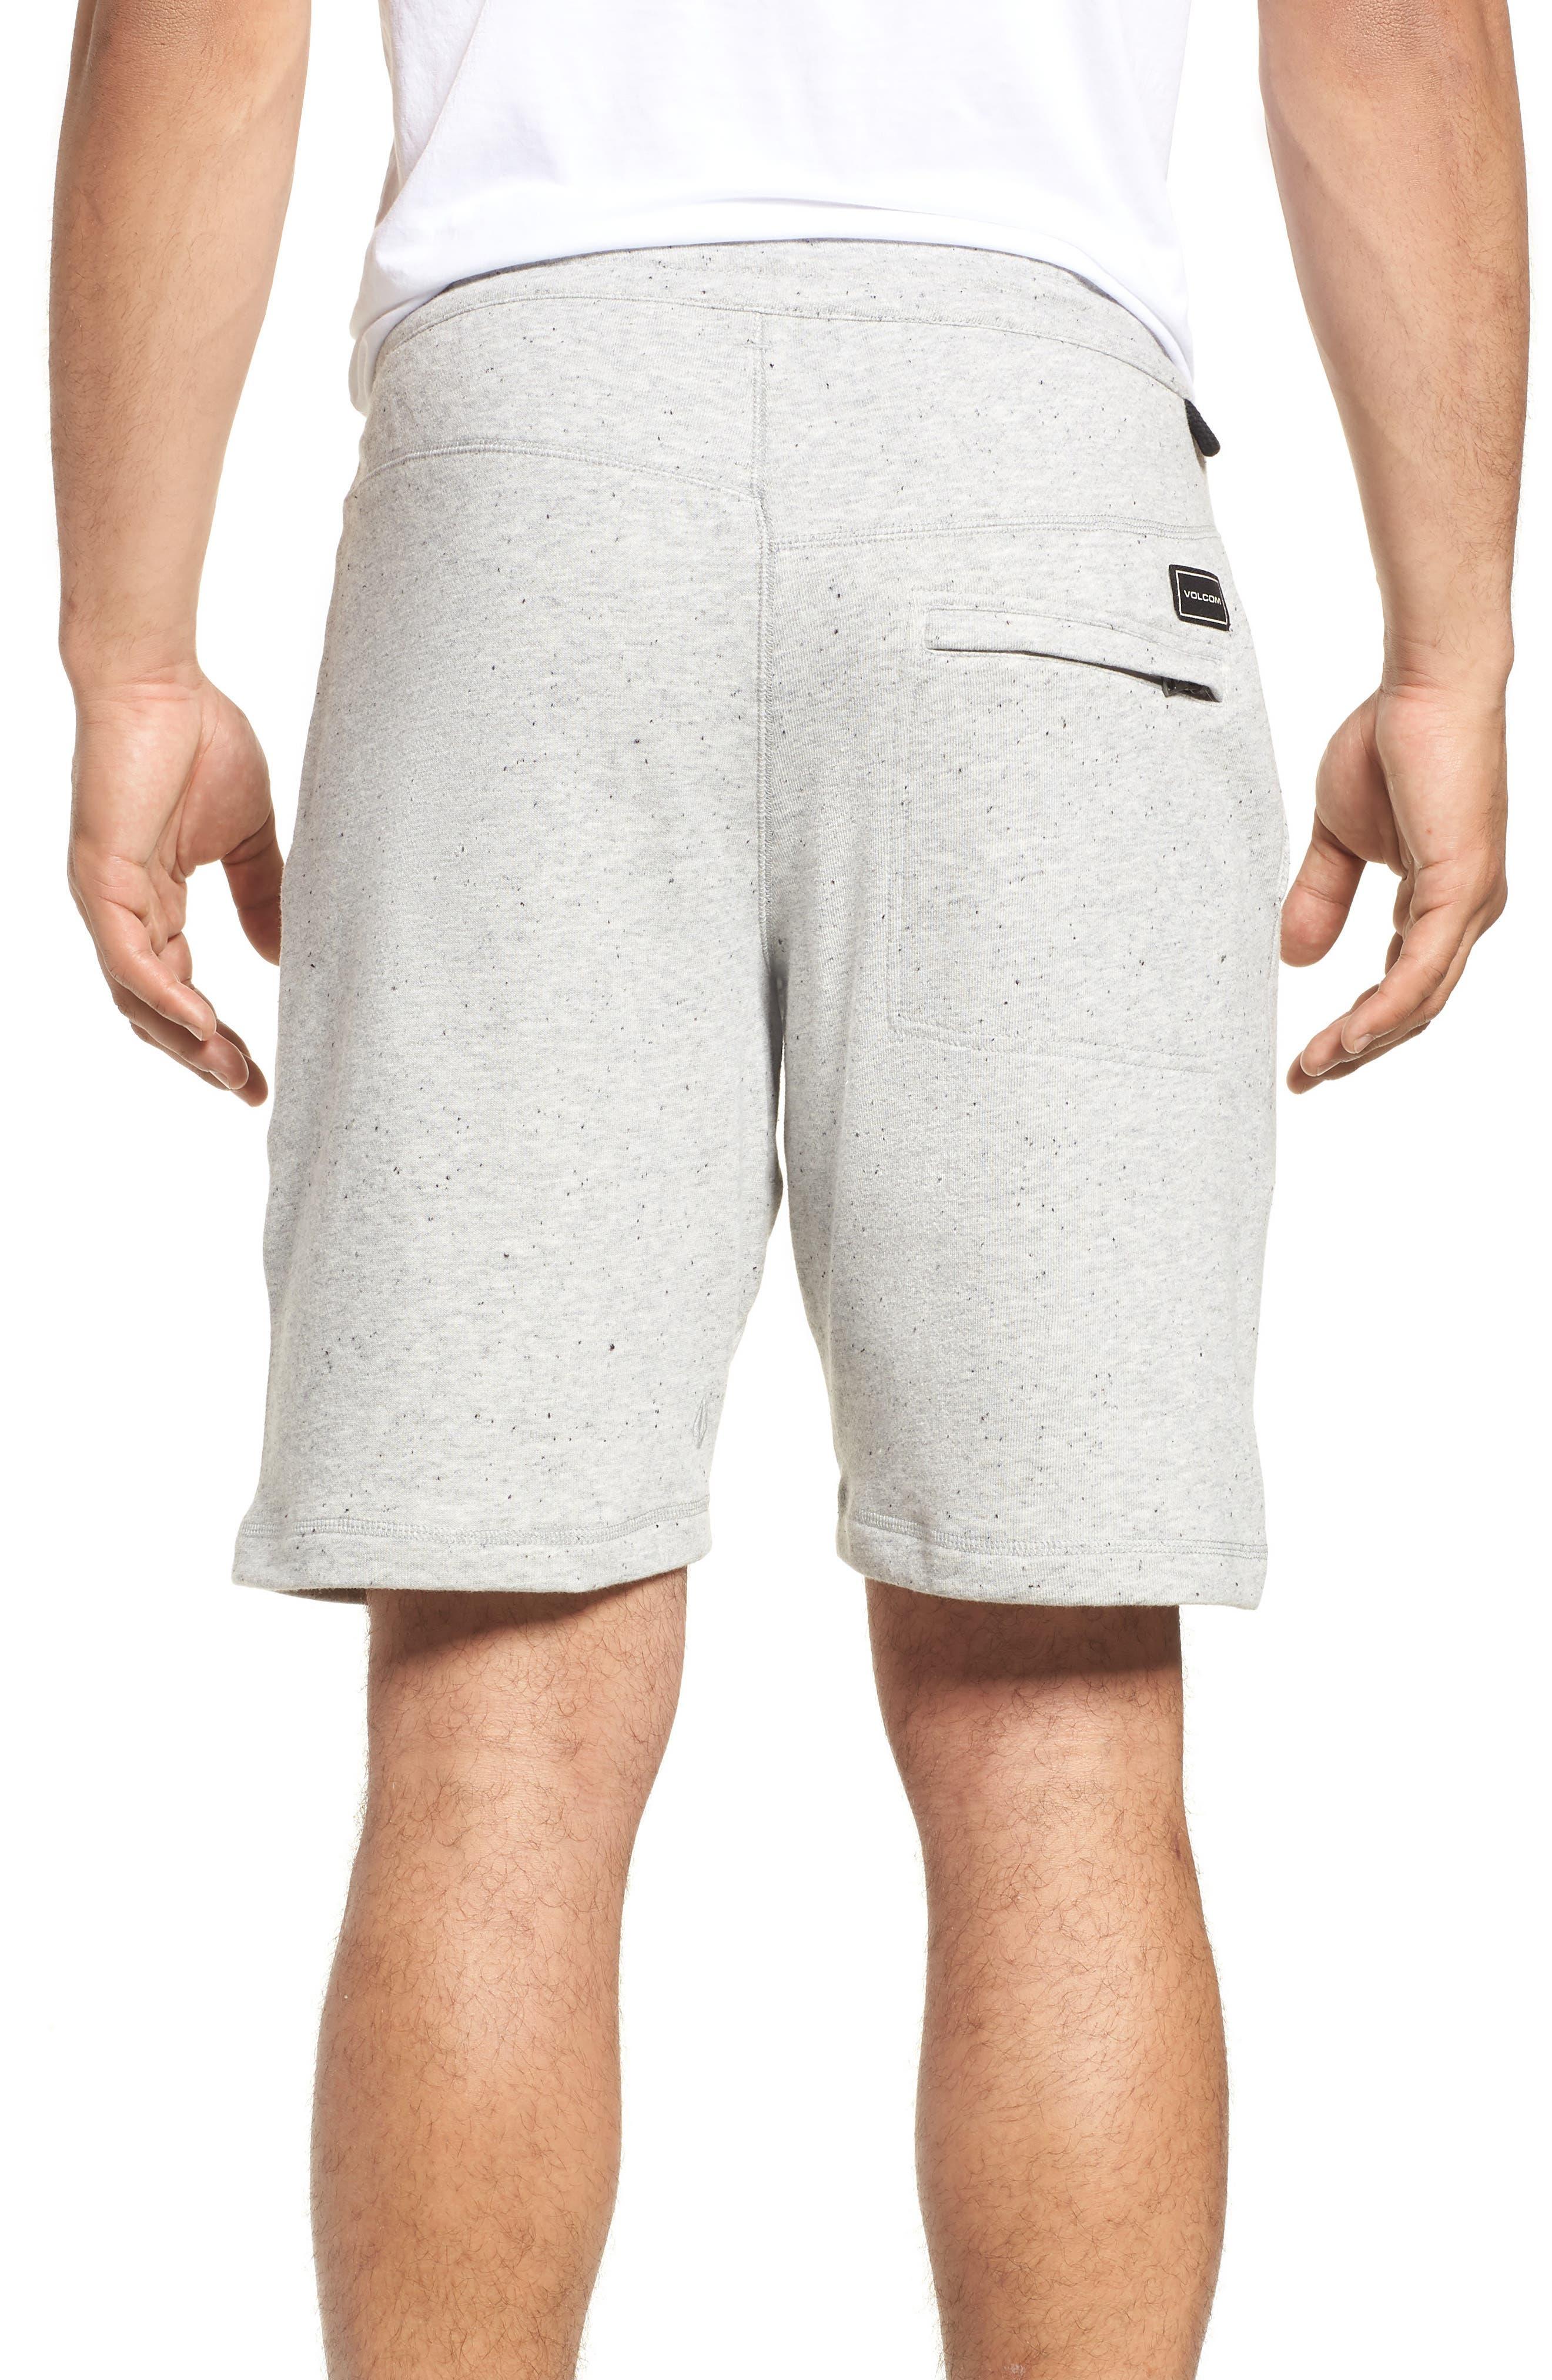 Chiller Shorts,                             Alternate thumbnail 2, color,                             GREY